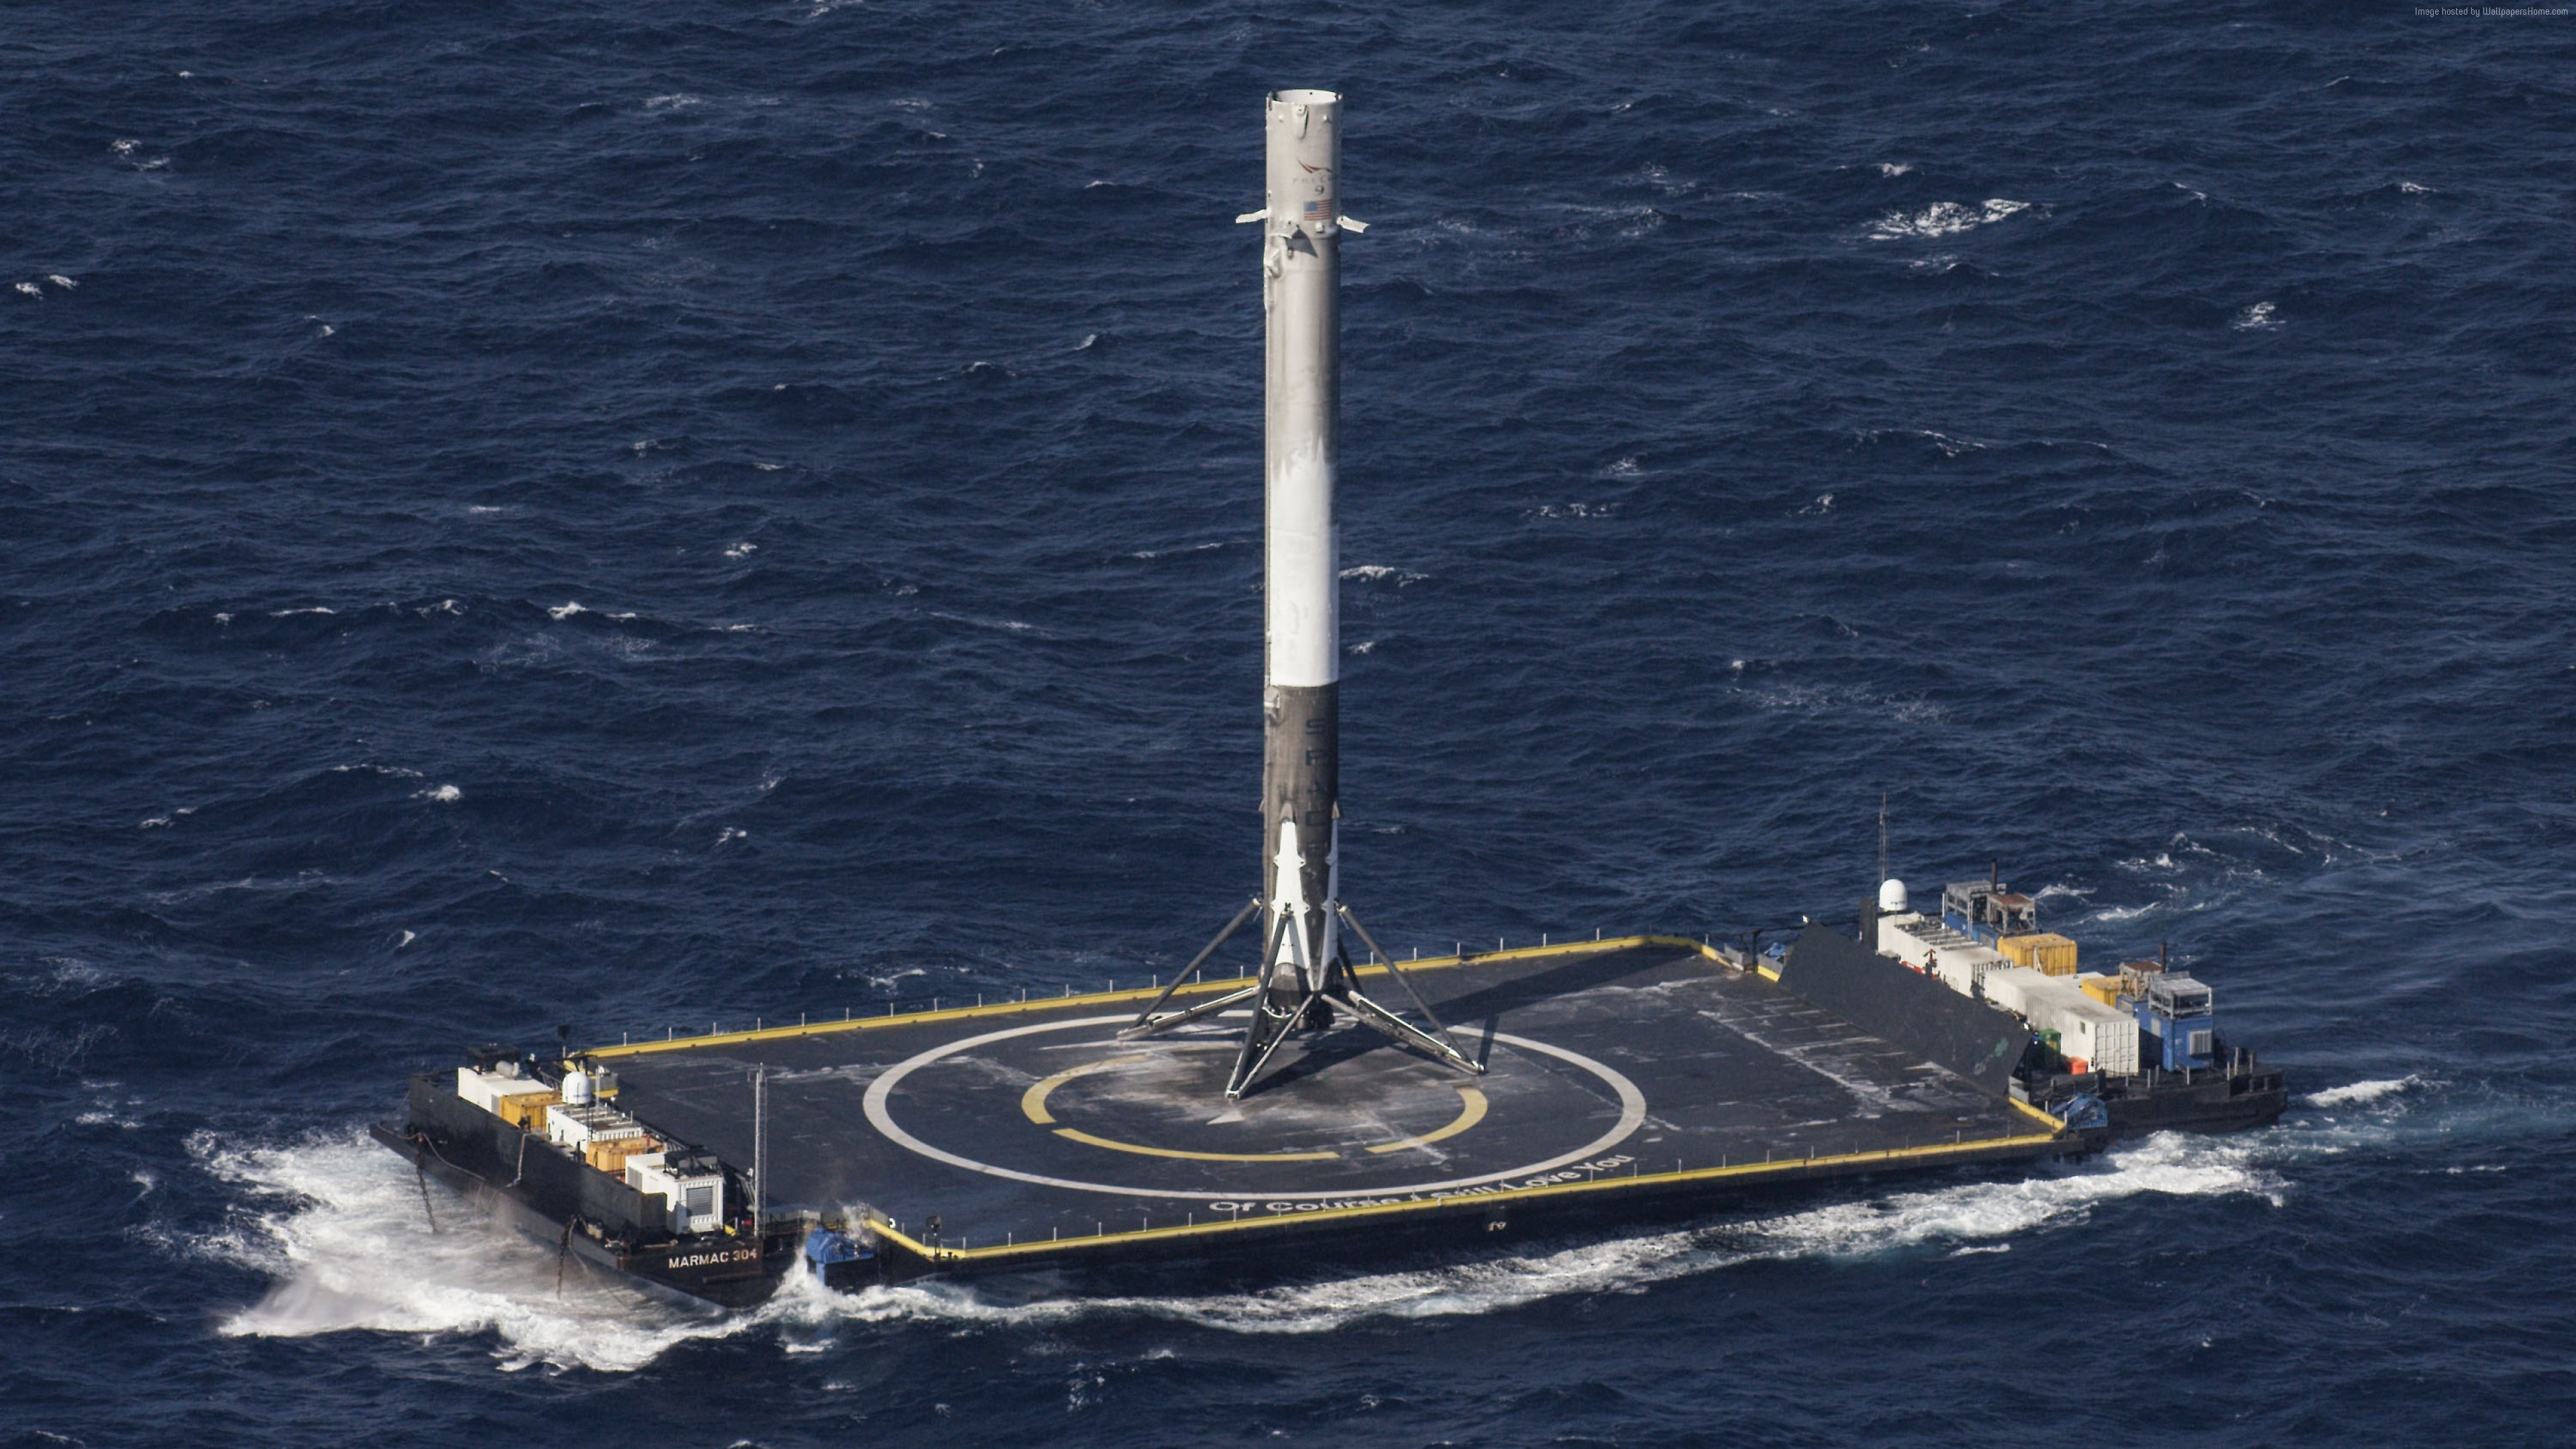 Wallpaper Spacex Ship Sea Platform Rocket Space